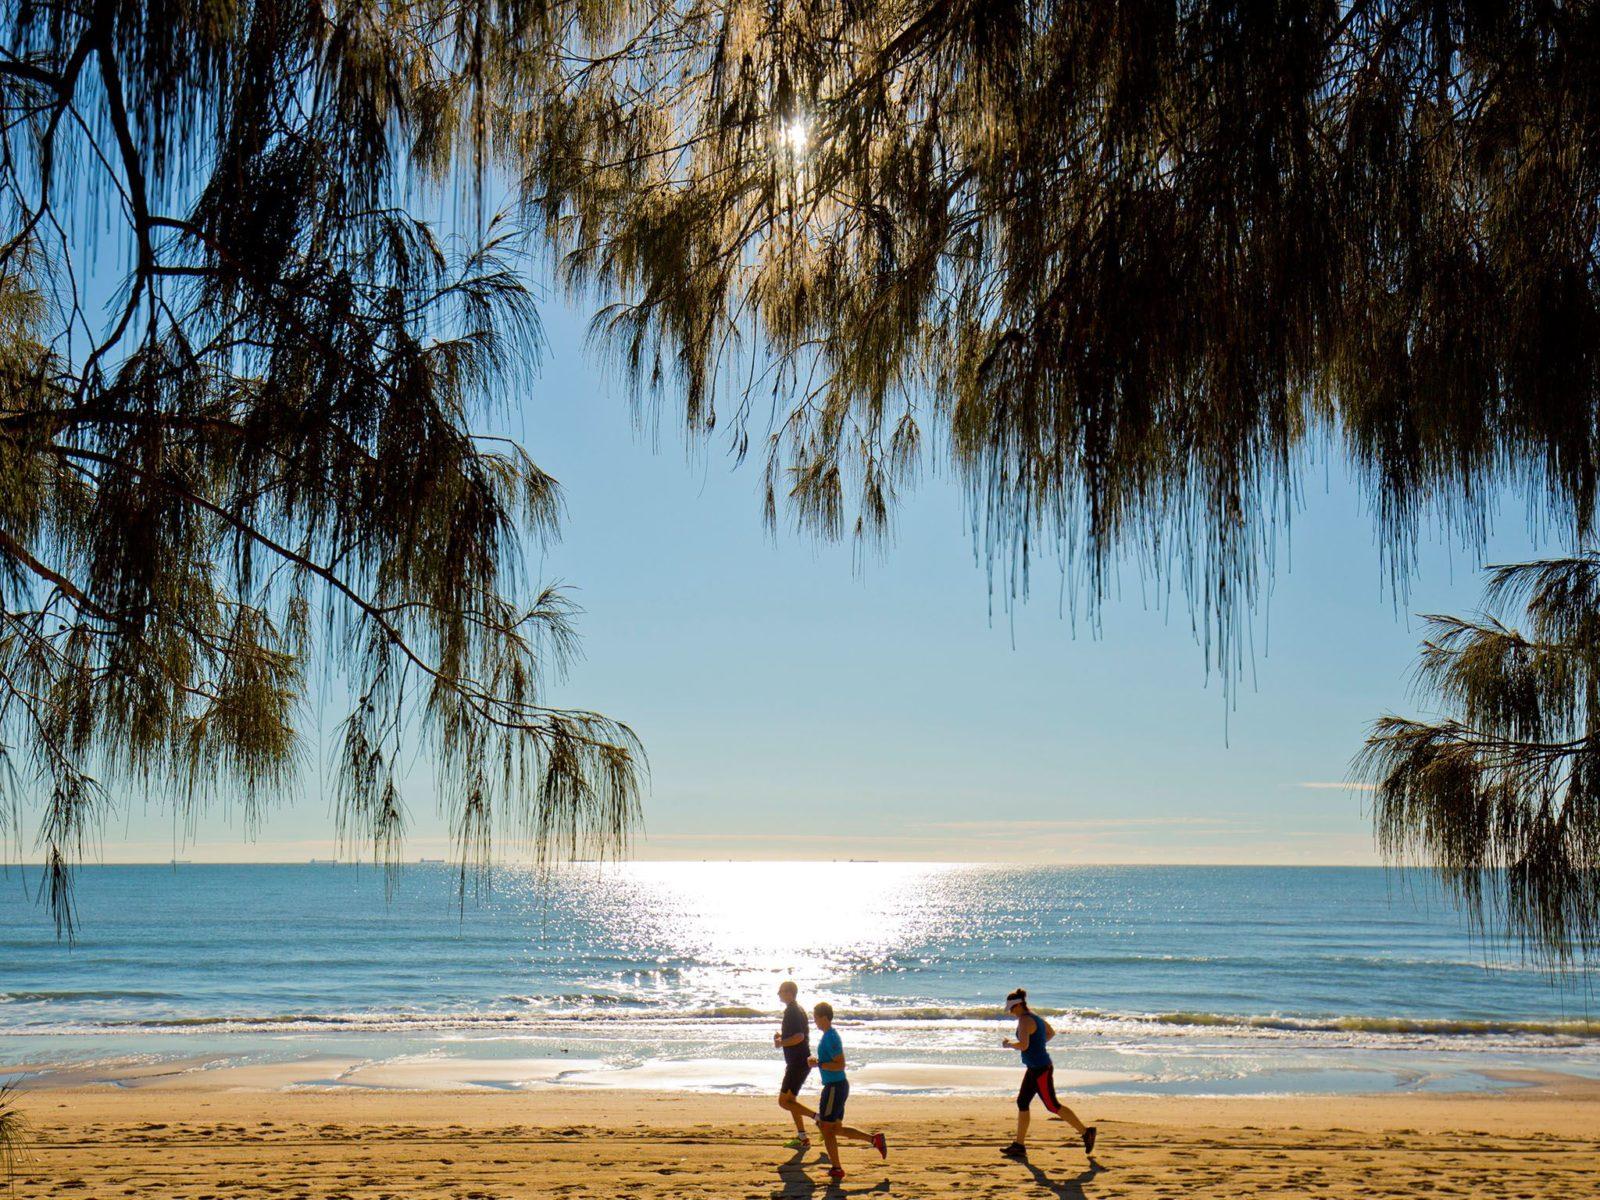 Tannum Sands Beach